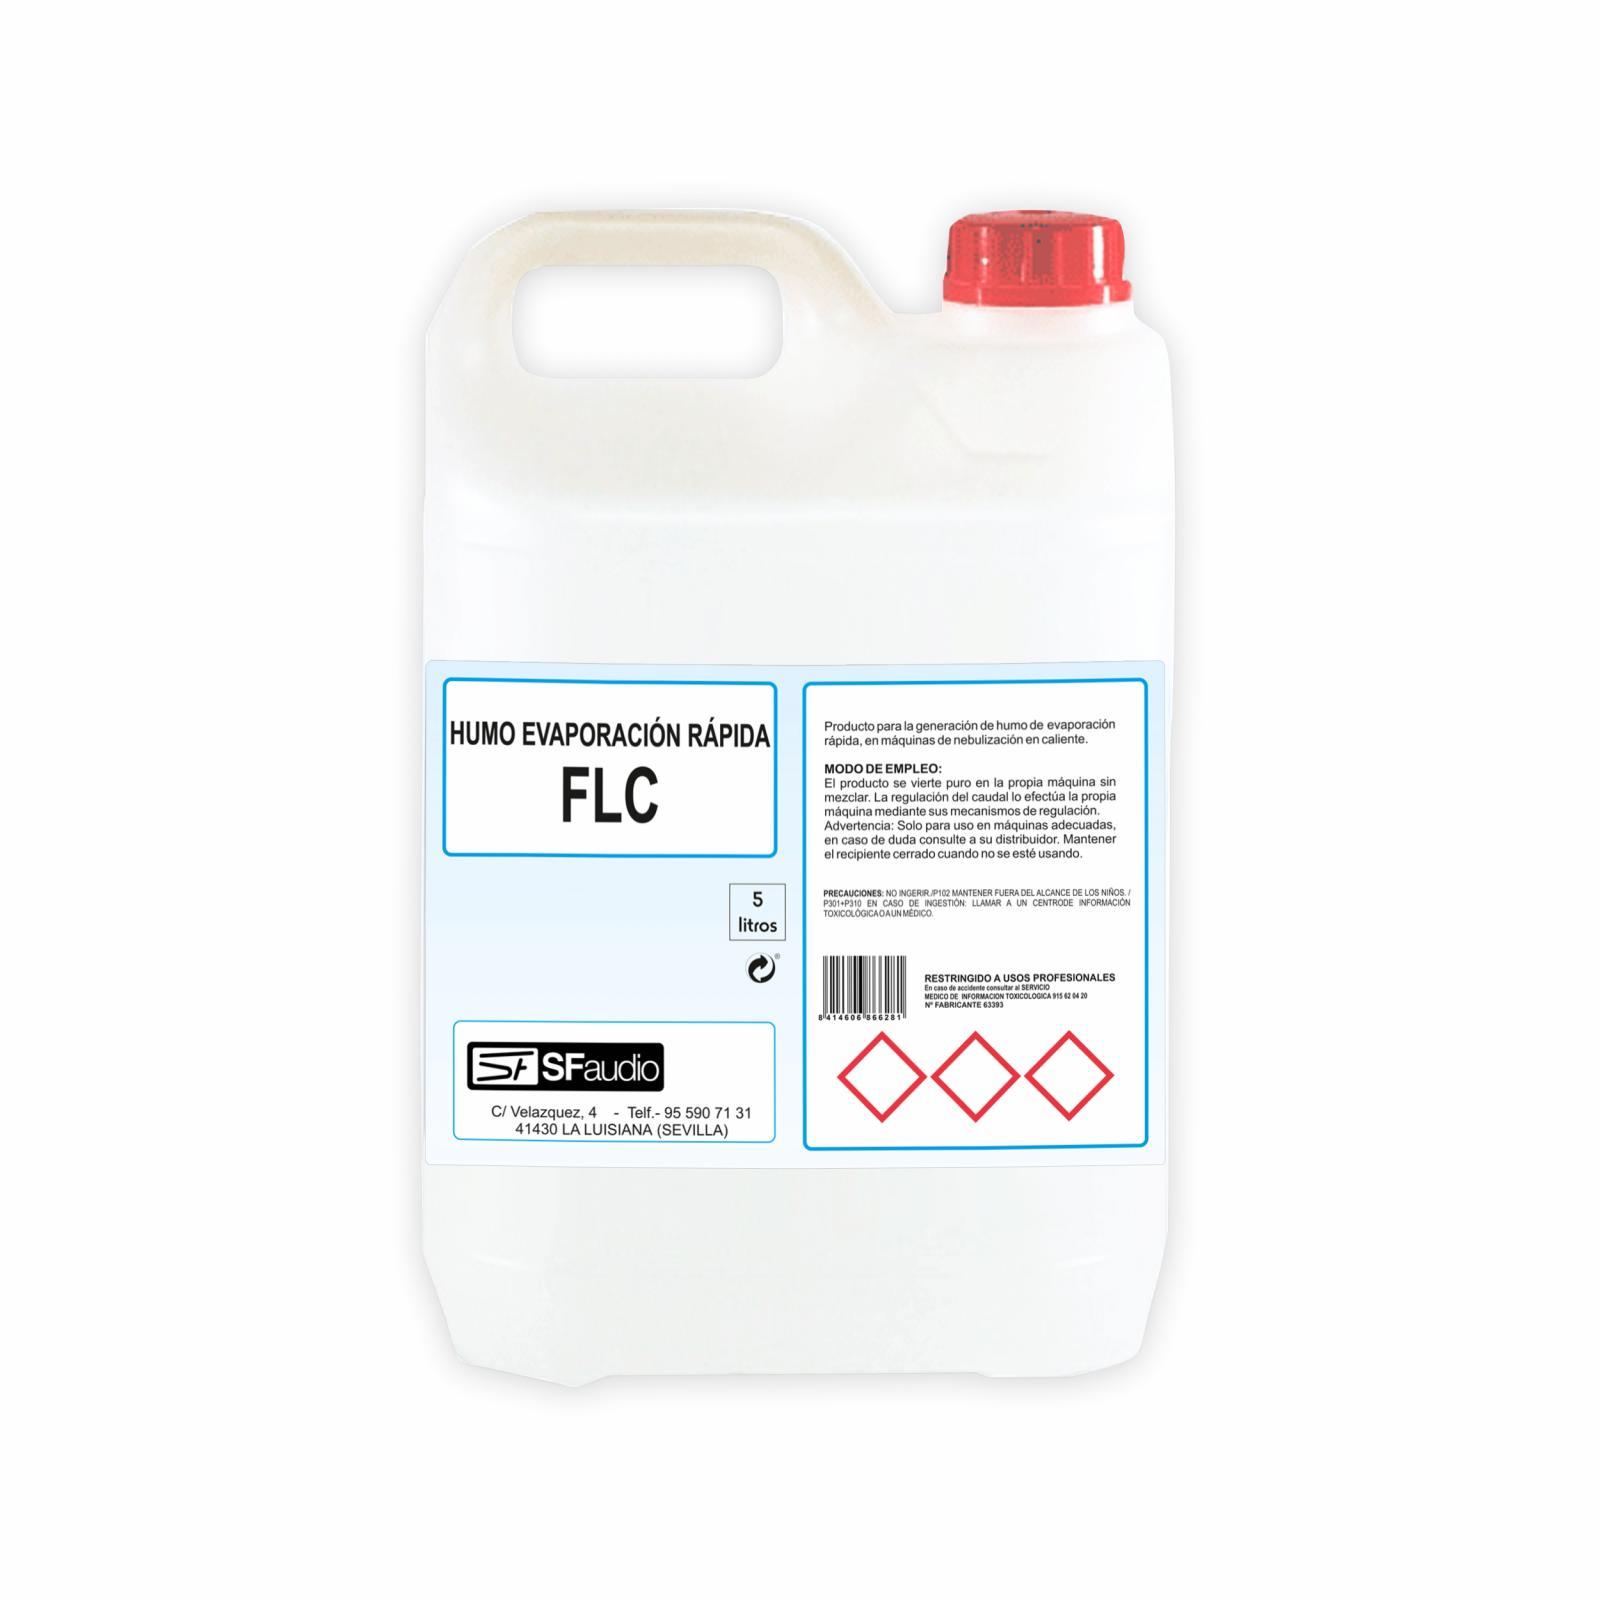 Líquido de Humo FLC-5 (5 lts.)